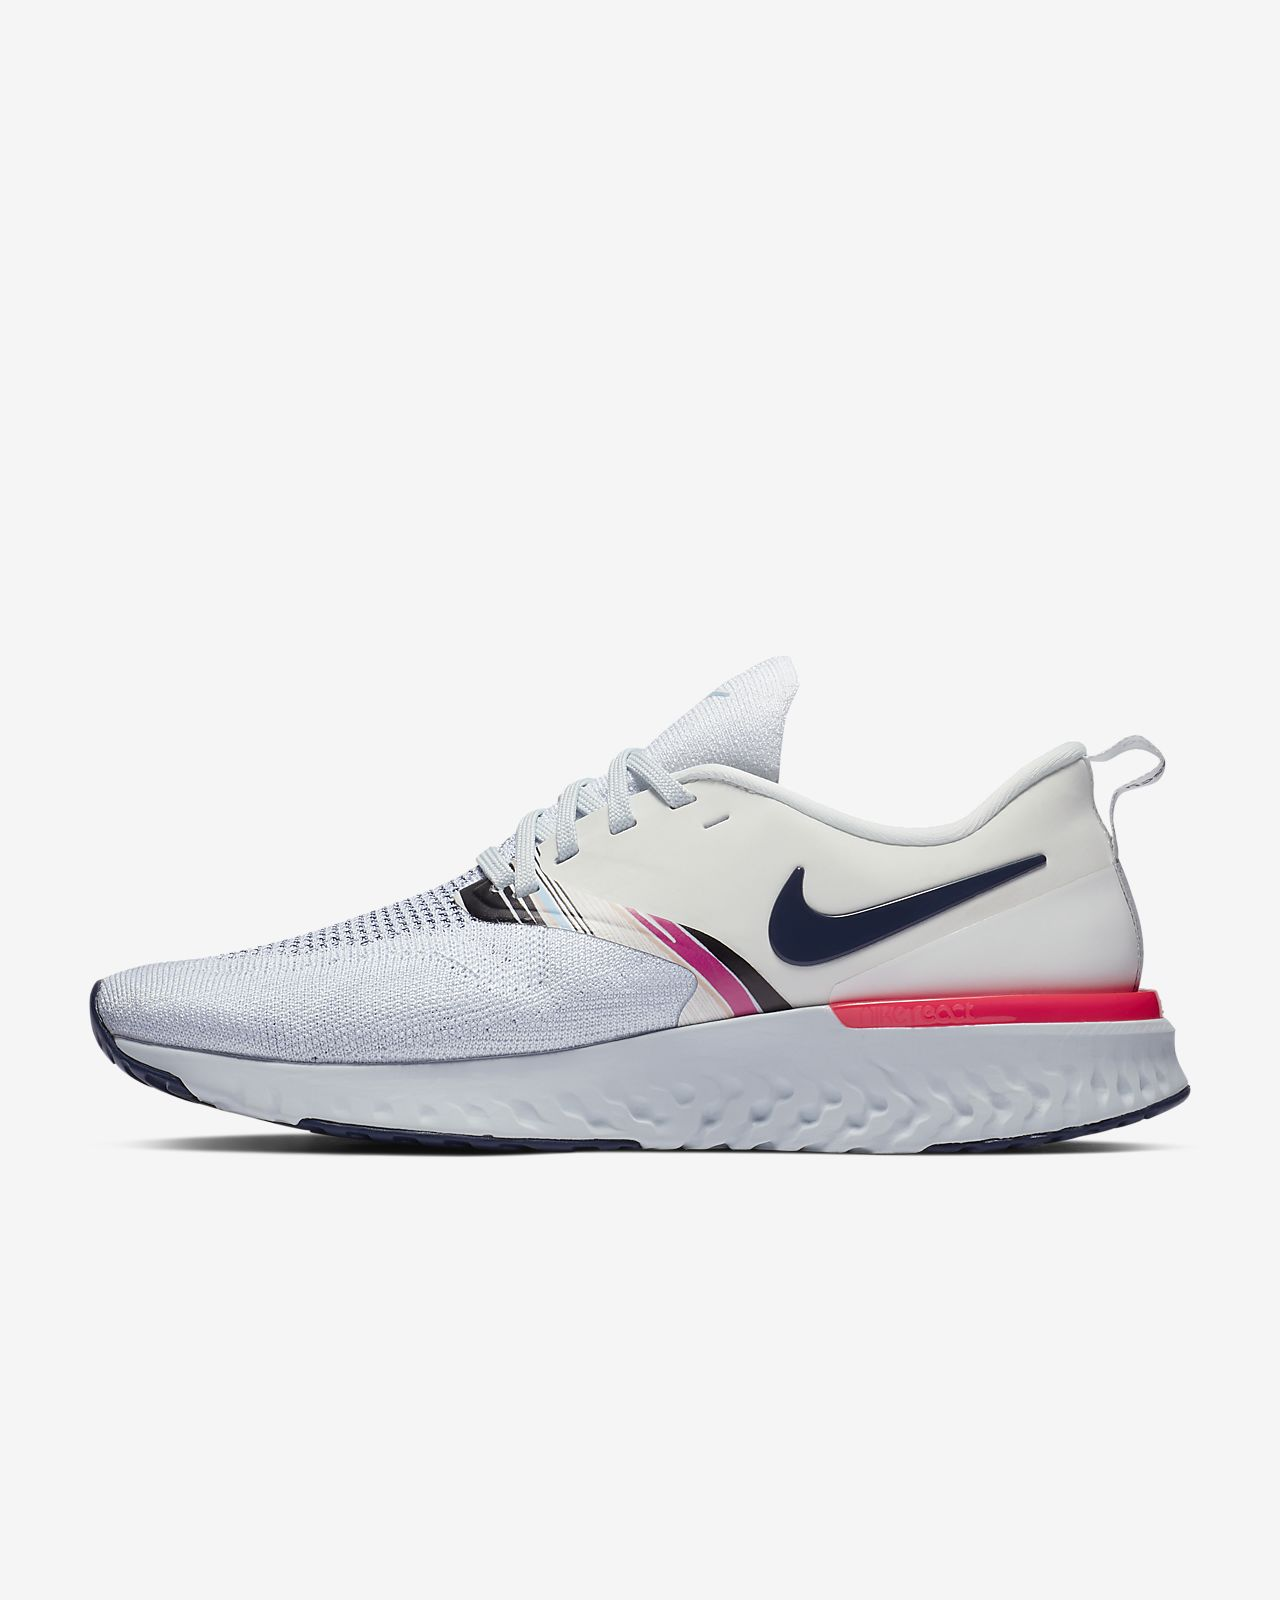 46df18d6c24fc9 Nike Odyssey React Flyknit 2 Premium Damen-Laufschuh. Nike.com DE